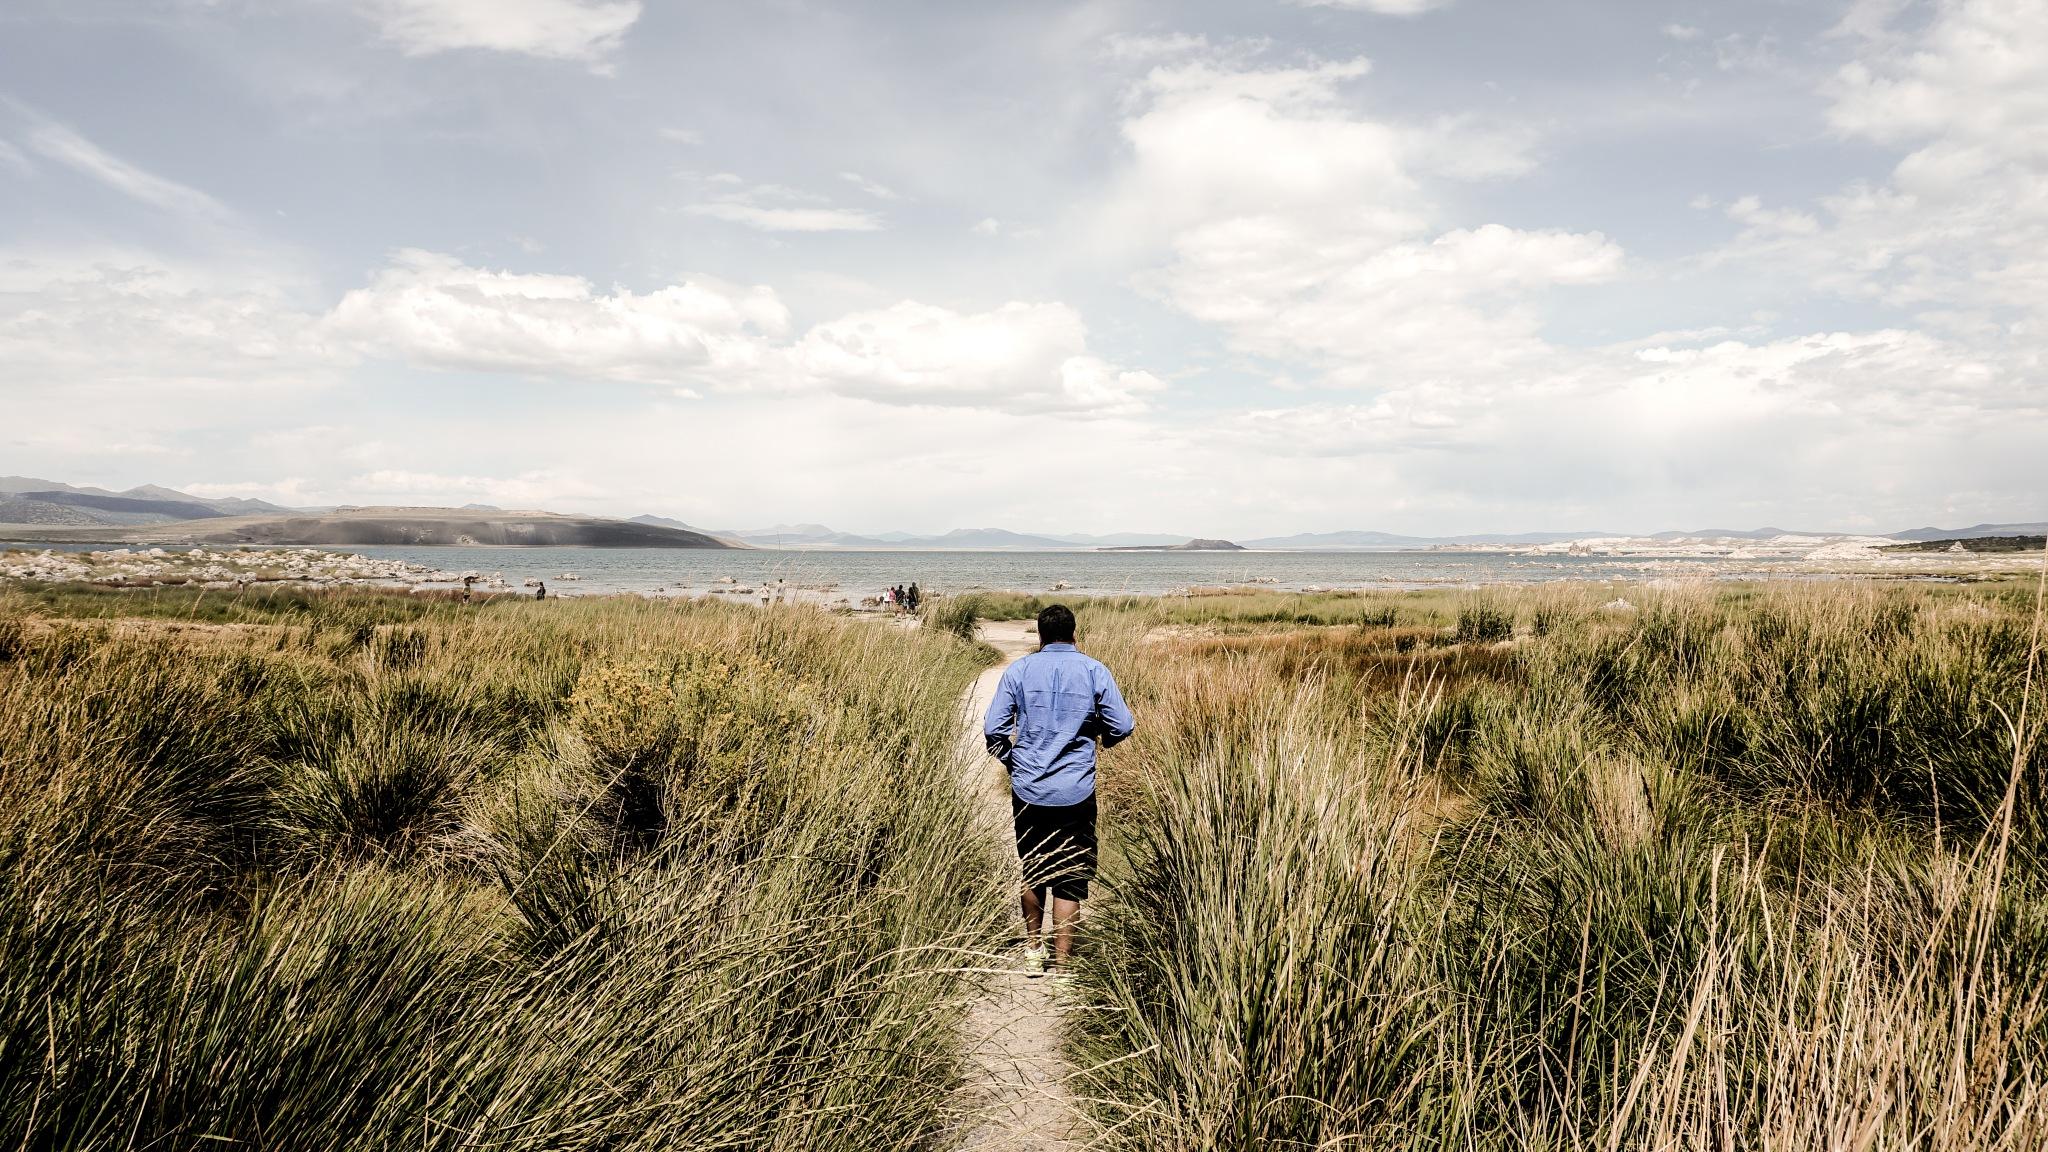 Path to Mono Lake by Tushar Sathe